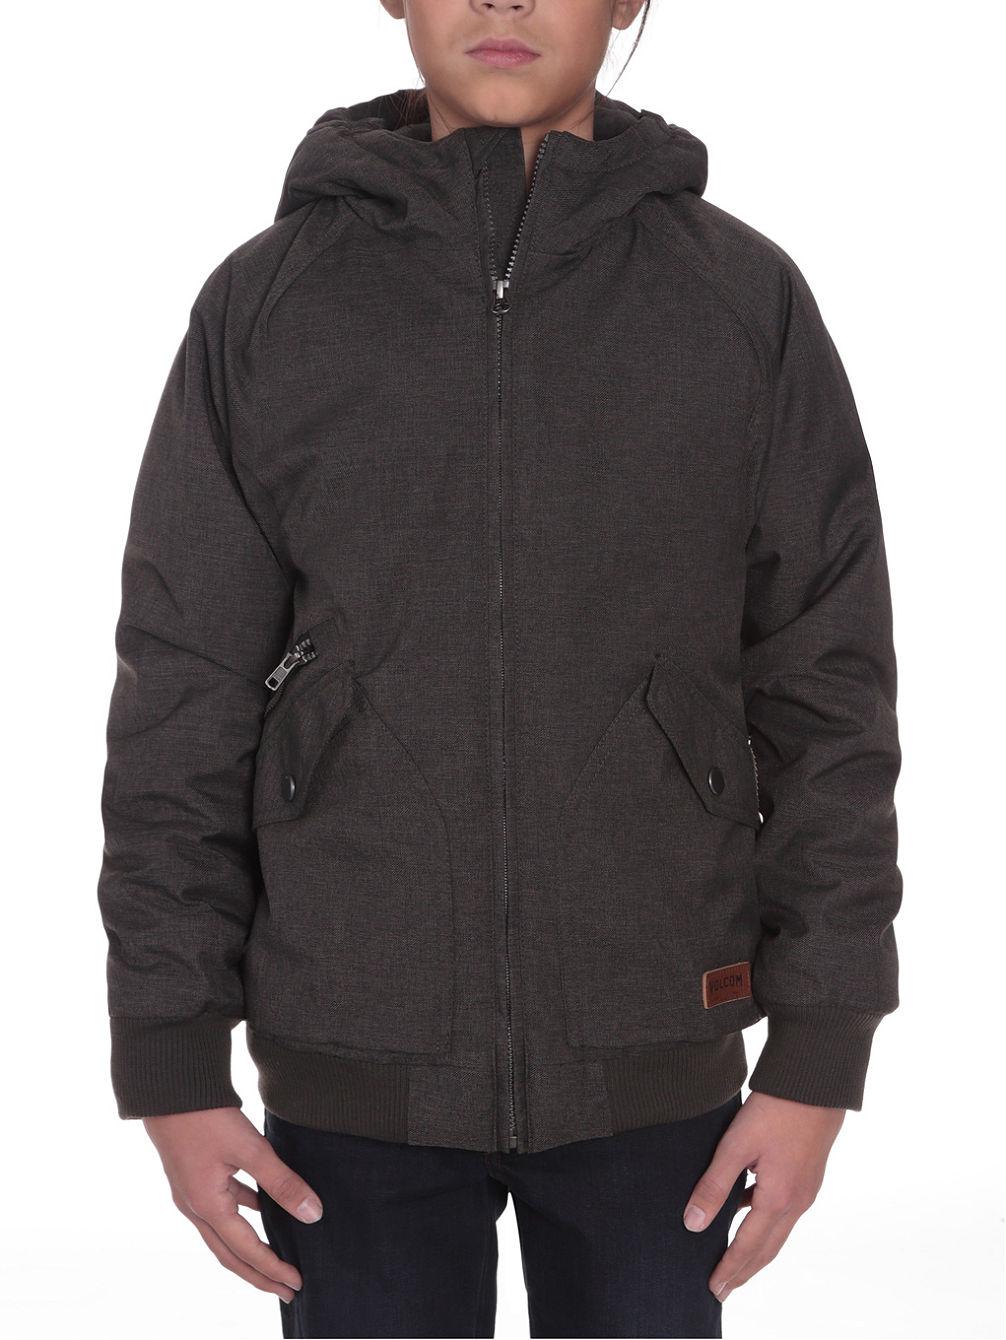 volcom-master-coaster-jacket-boys